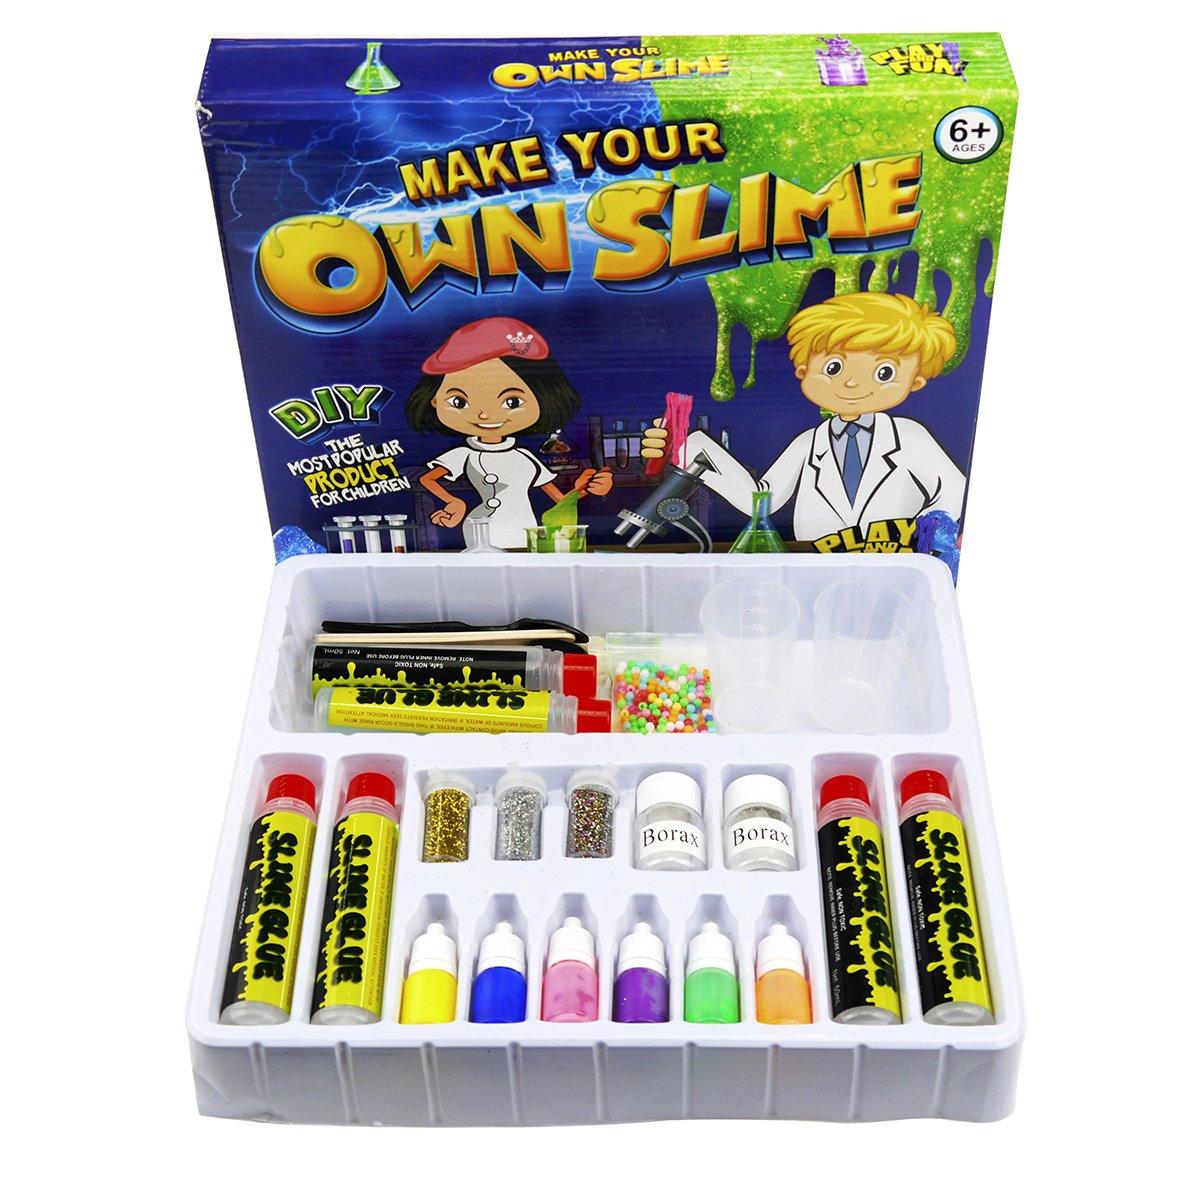 ooey gooey Slime Kit - Slime Making Supplies - DIY Slime Kit for Kids - Make Clear Slime, Glitter Slime, Glow in the Dark Slime, Neon colors - Fun Chemistry Science Lab for Both Boys and Girls by ooey gooey